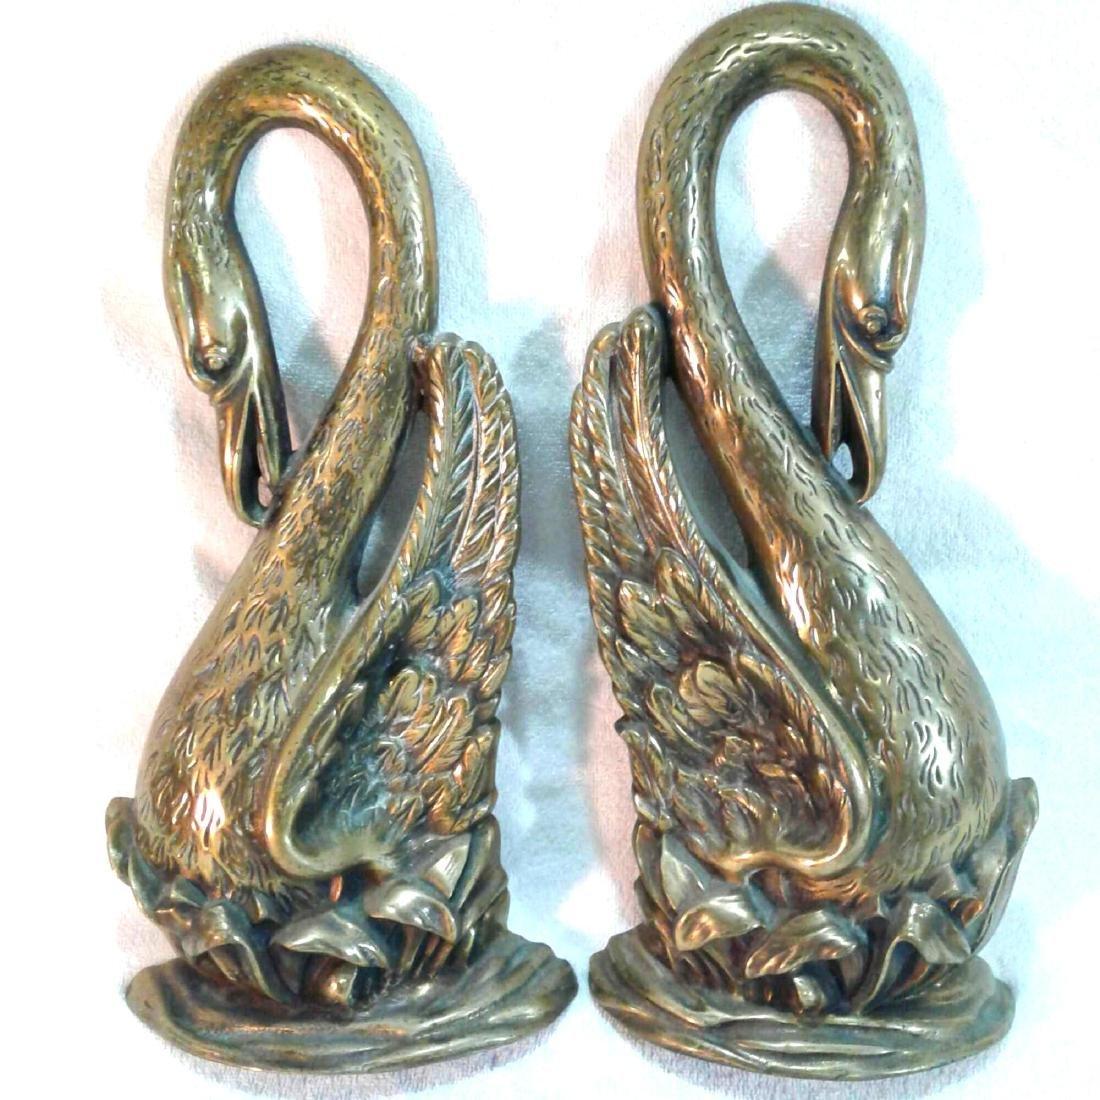 2 Brass Decorative Swans